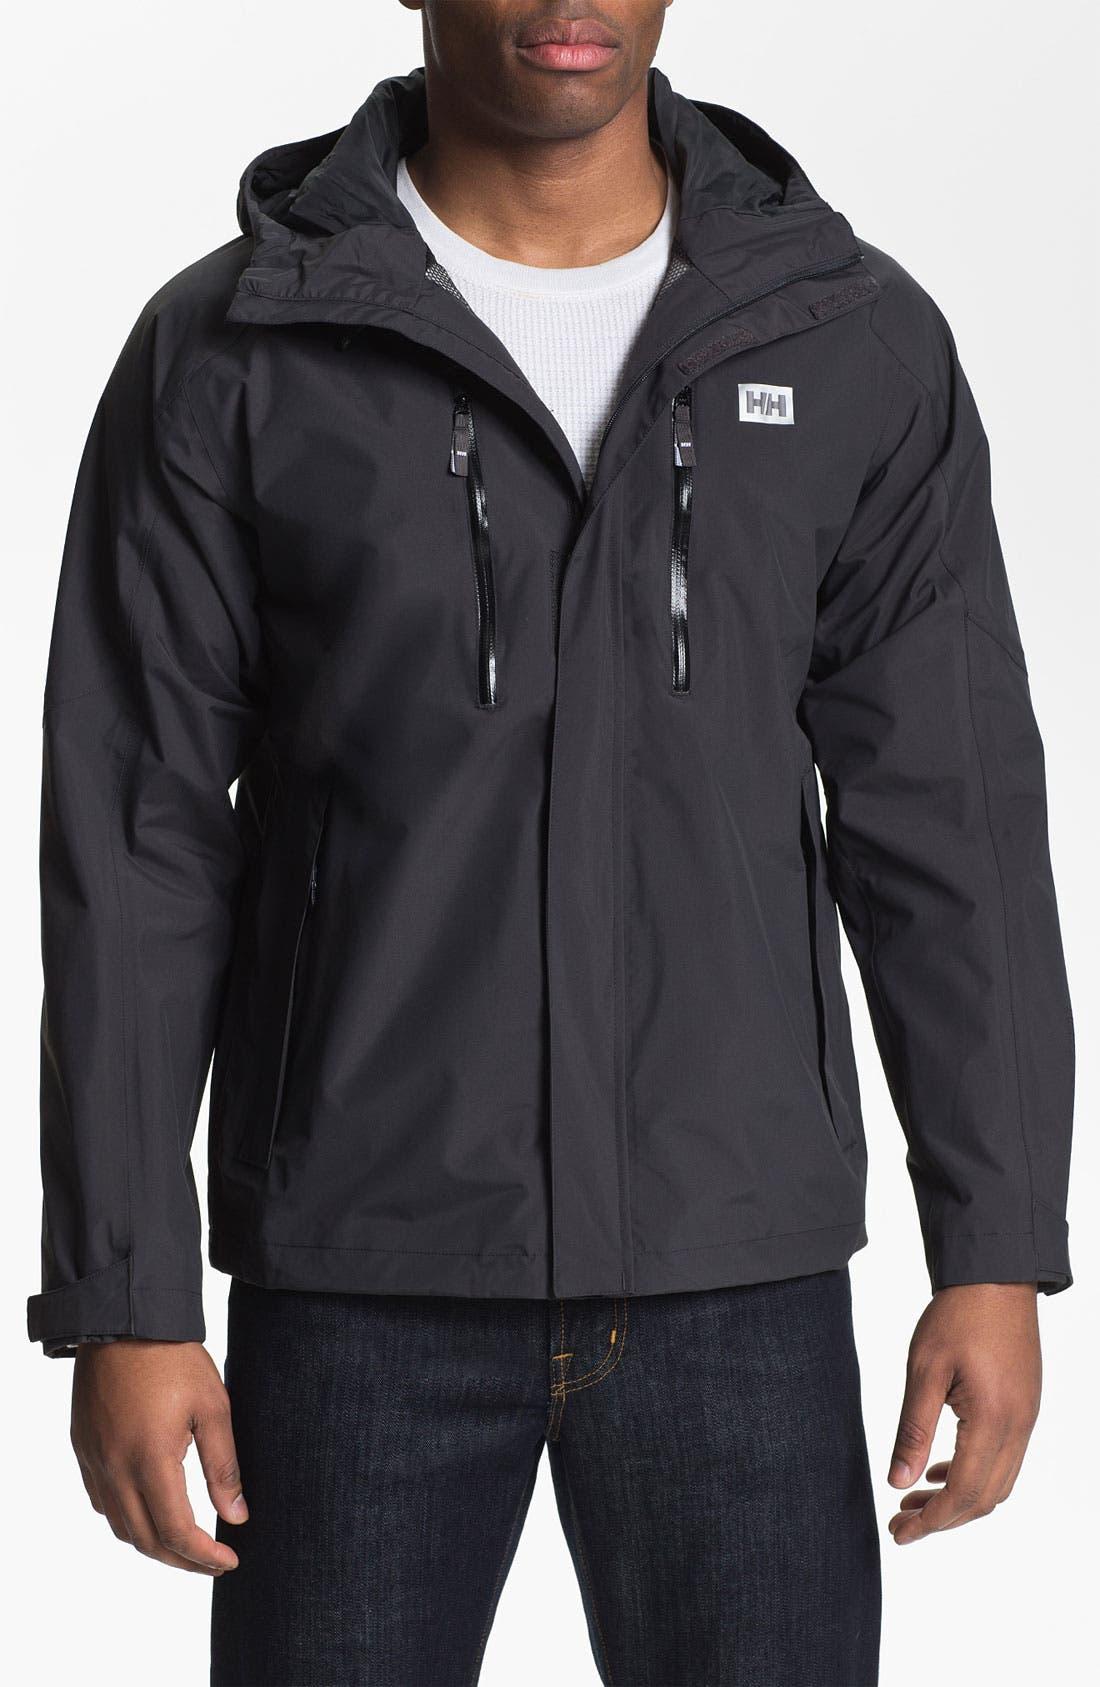 Alternate Image 1 Selected - Helly Hansen 'Seattle' Packable Jacket